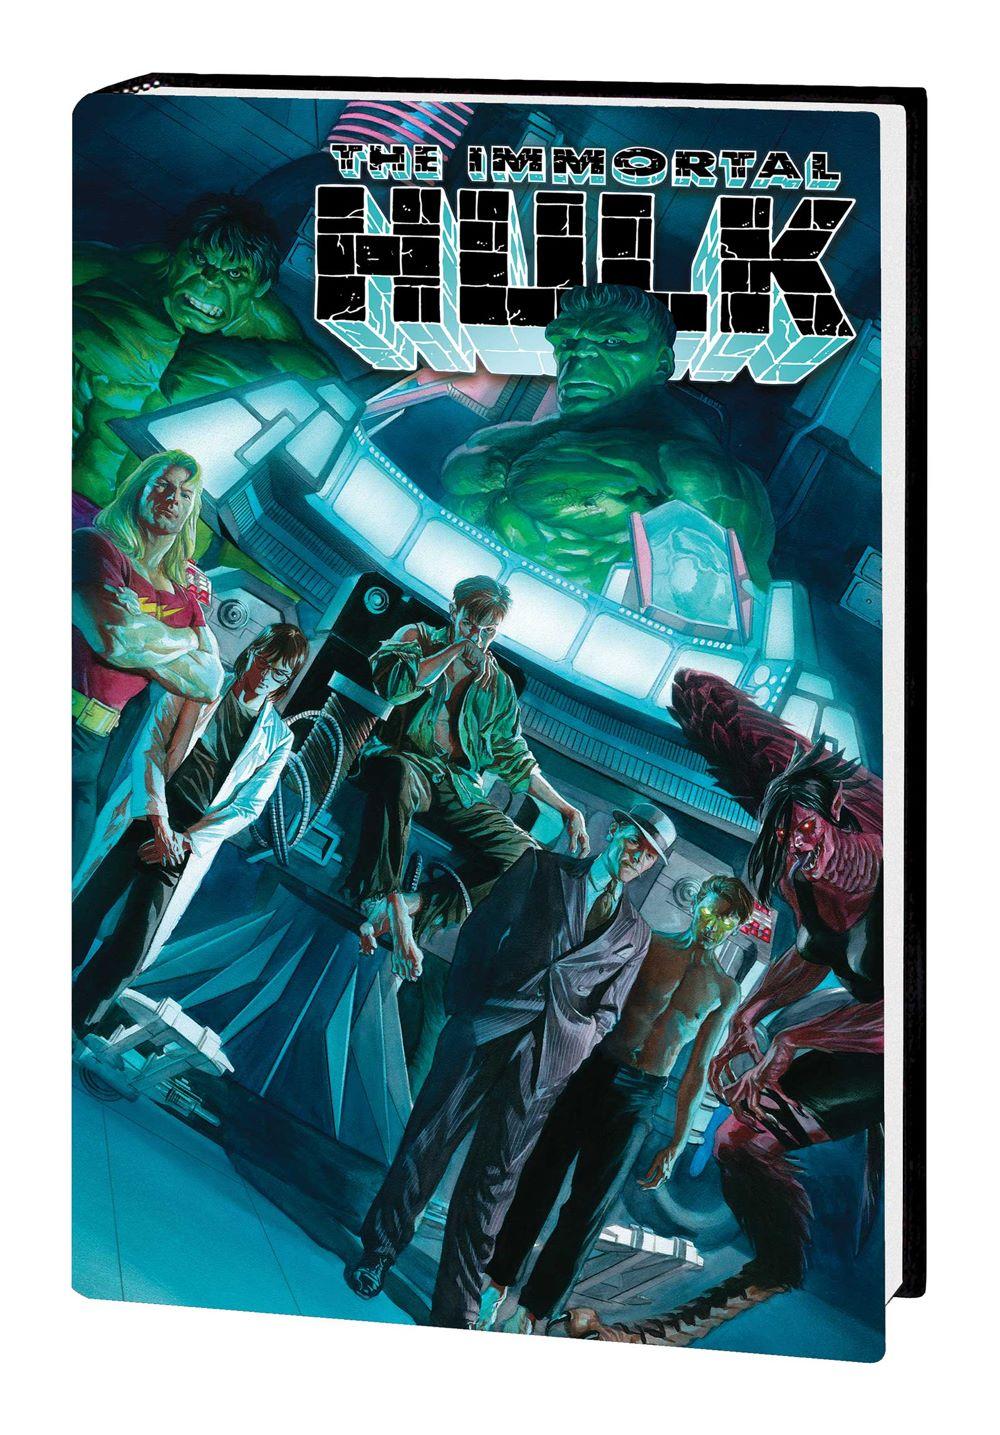 HULK_VOL_3_HC Marvel Comics January 2021 Solicitations